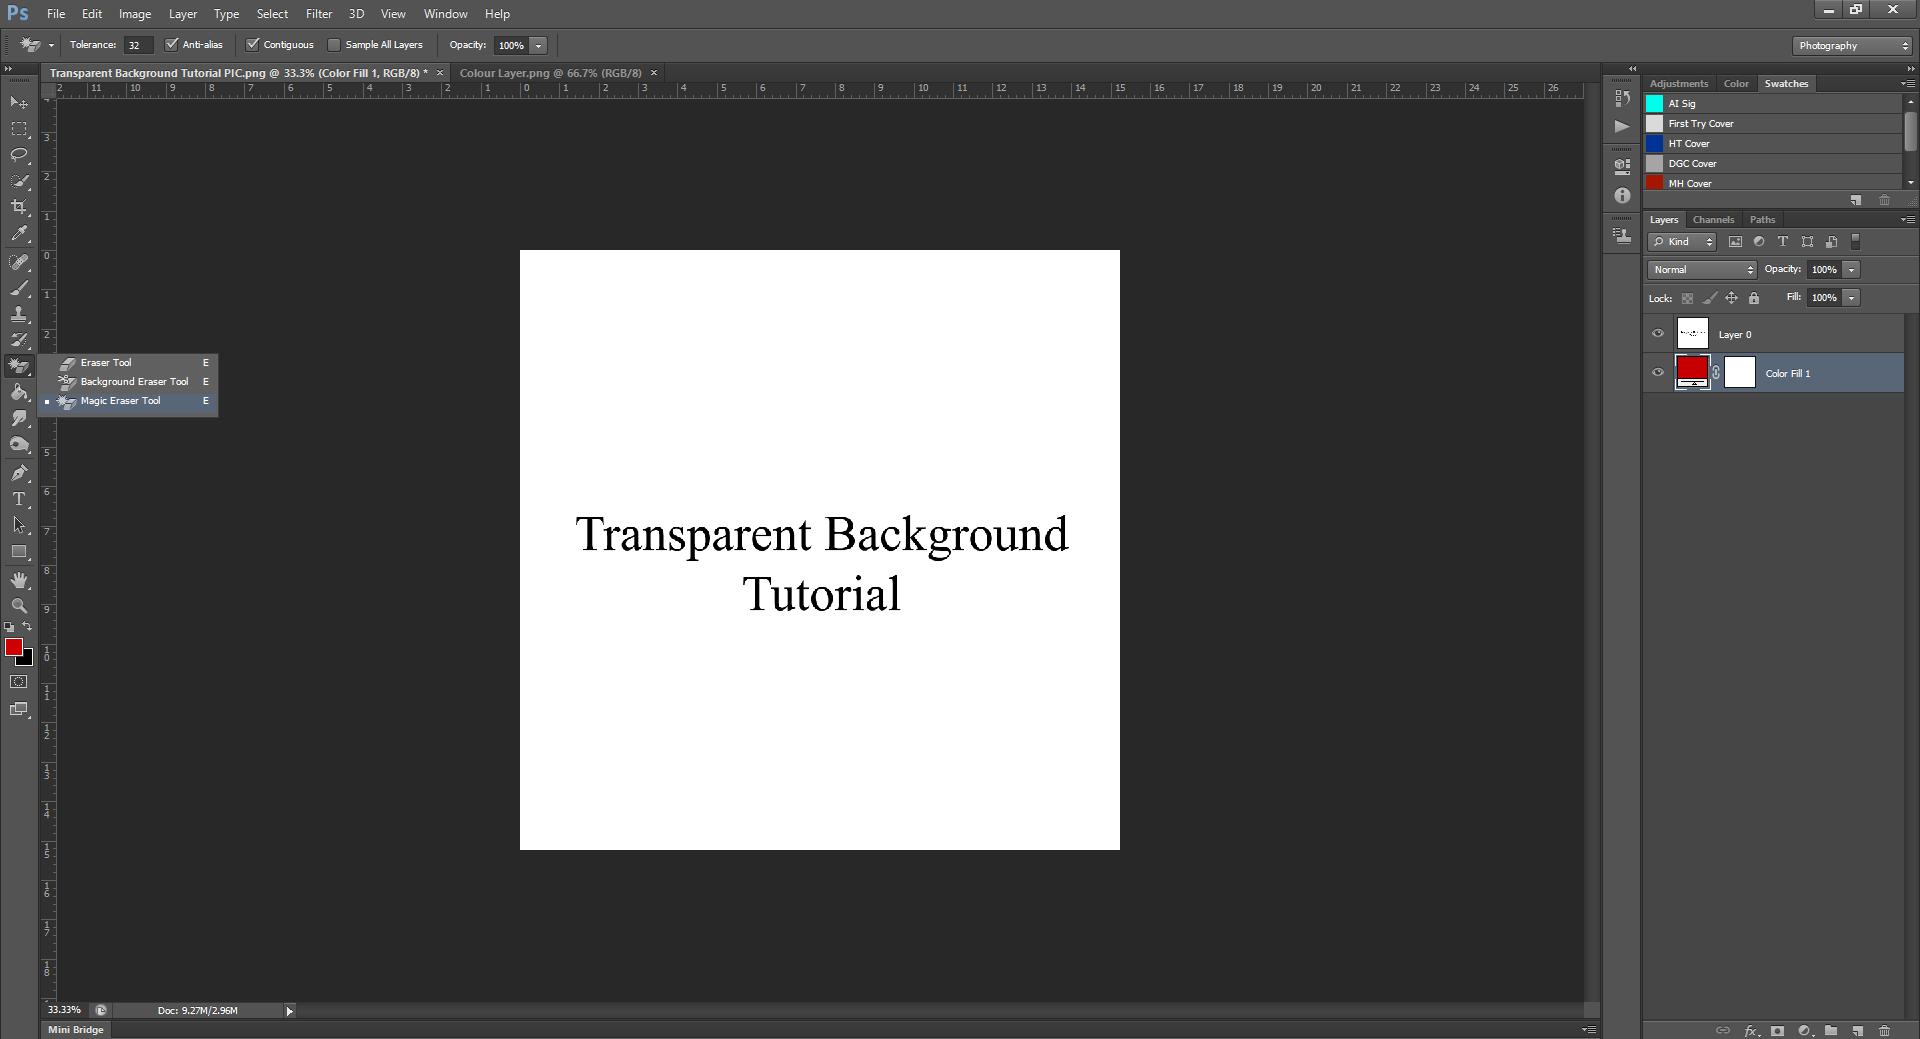 AterImber.com - Writing Tips - PHSH Tutorial - Making a Transparent Background - Magic Eraser Selection